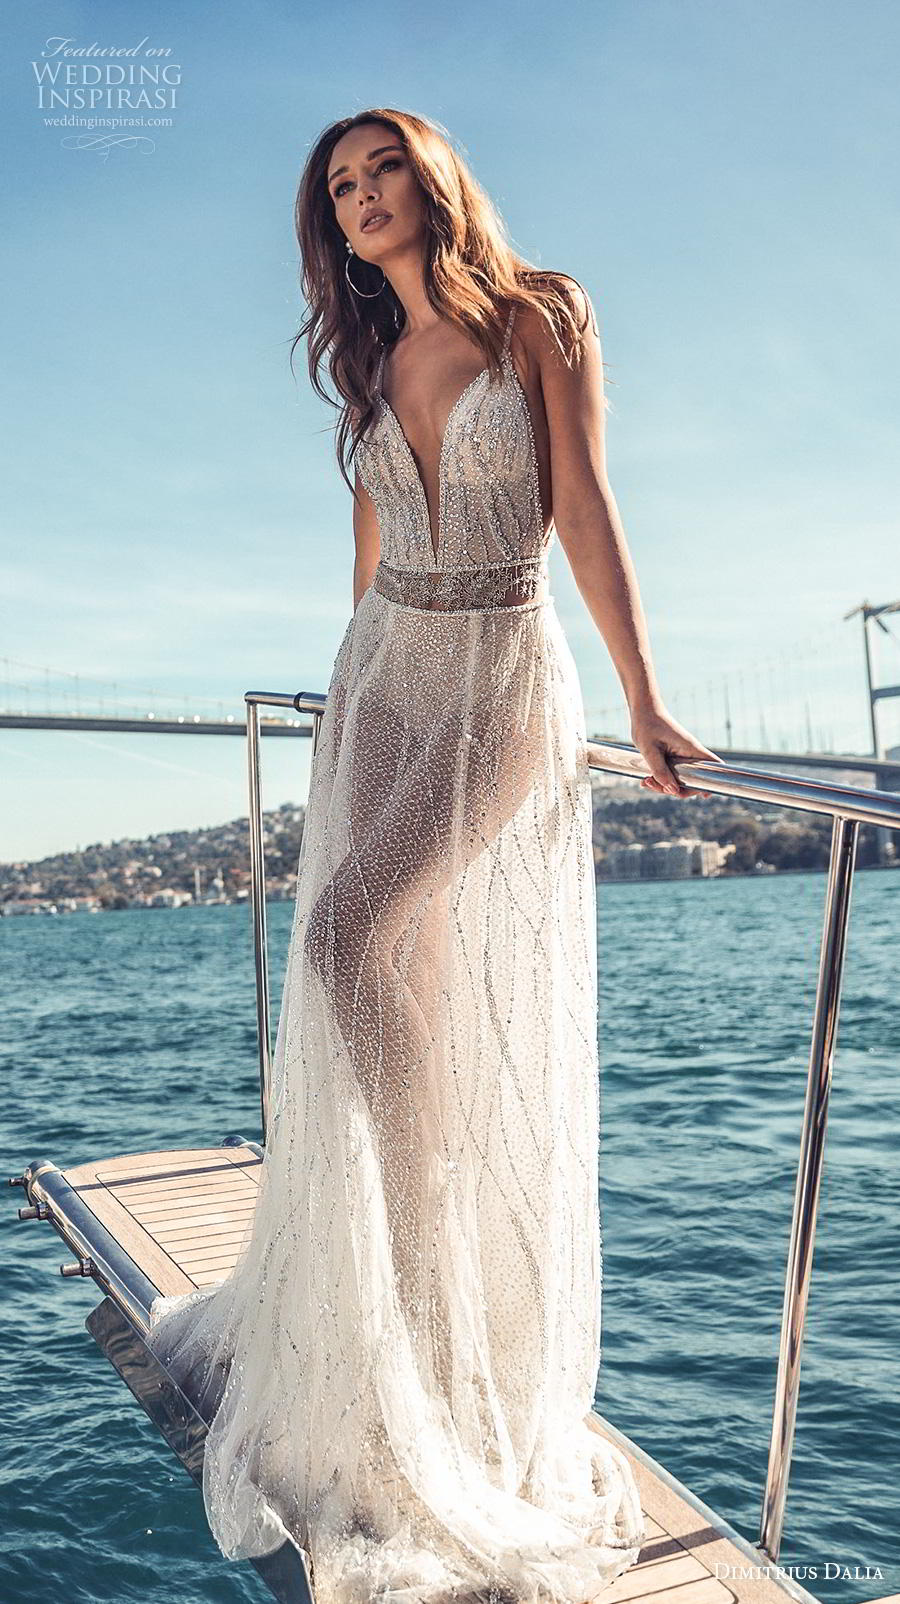 dimitrius dalia 2019 bridal sleeveless spaghetti strap deep plunging sweetheart neckline glitter glamorous sexy soft a  line wedding dress backless low back chapel train (6) mv